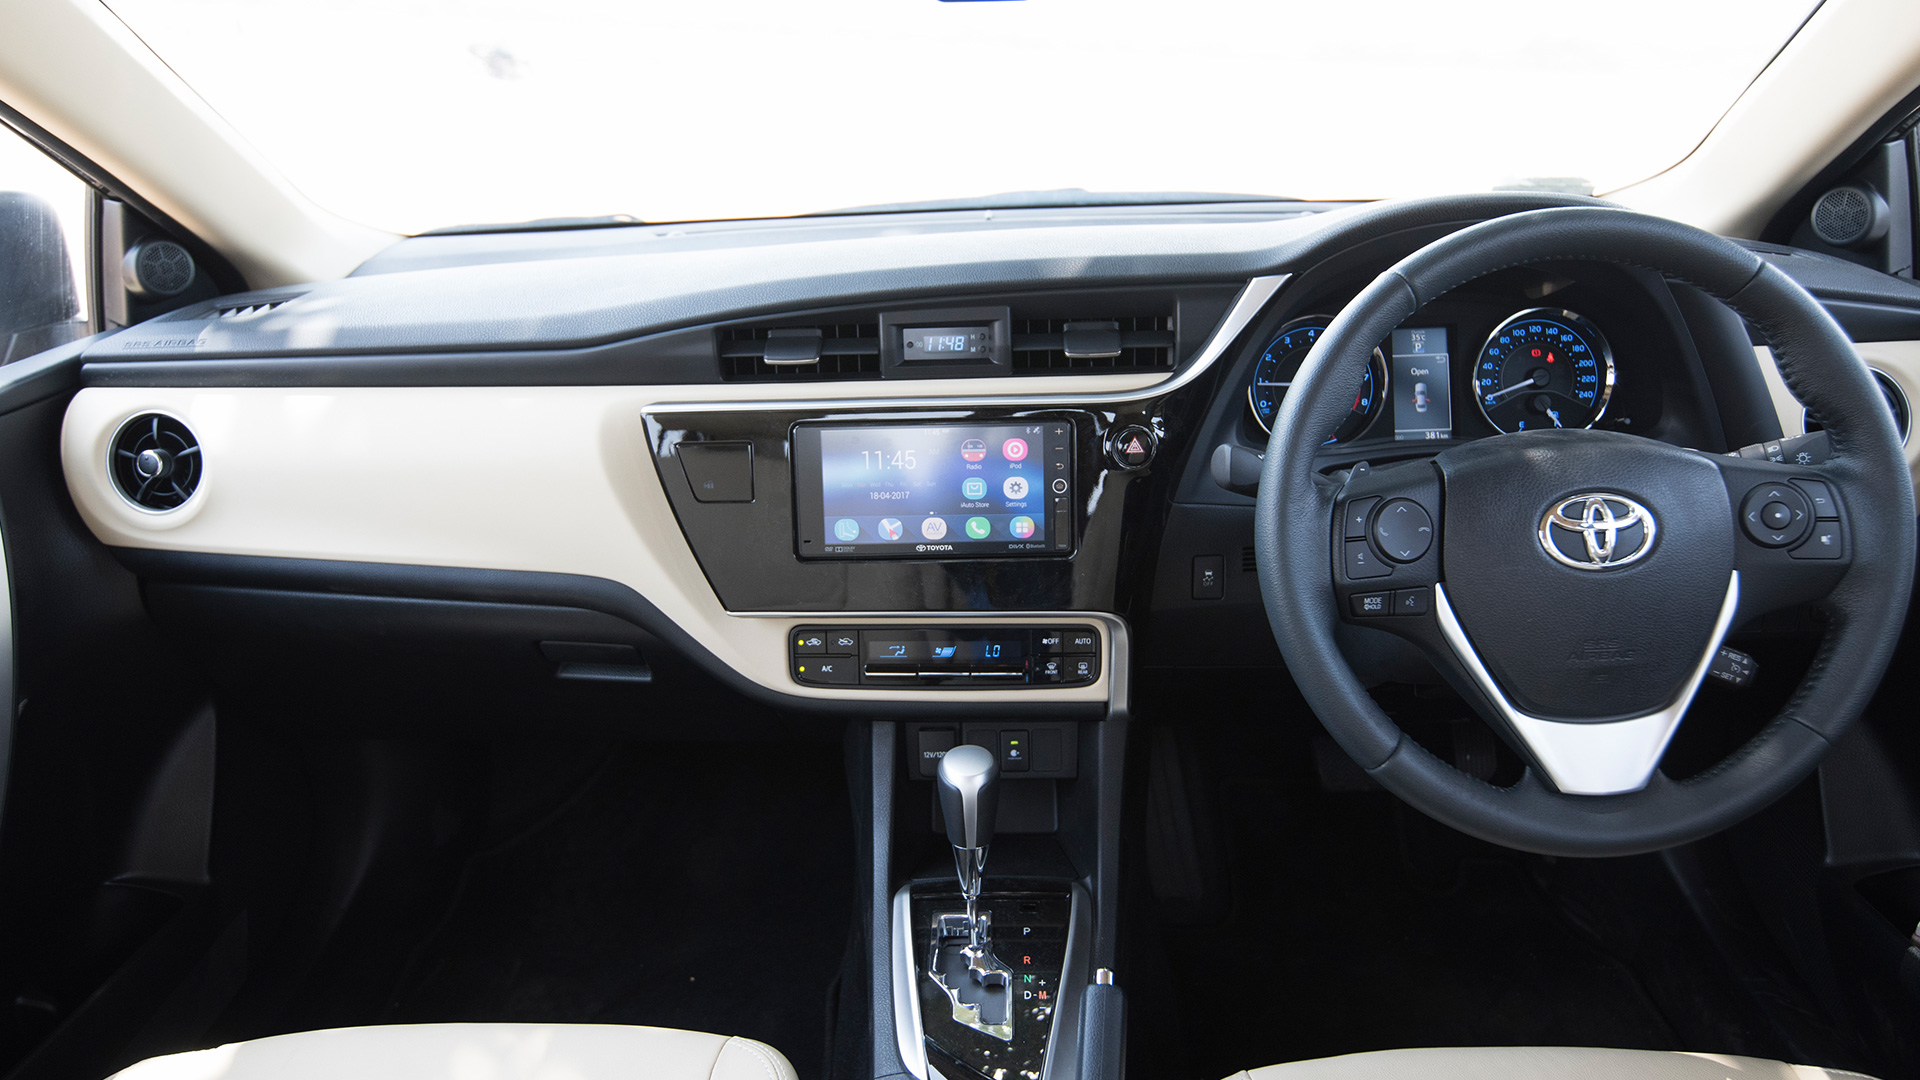 Toyota Corolla Altis Interior Billingsblessingbags Org